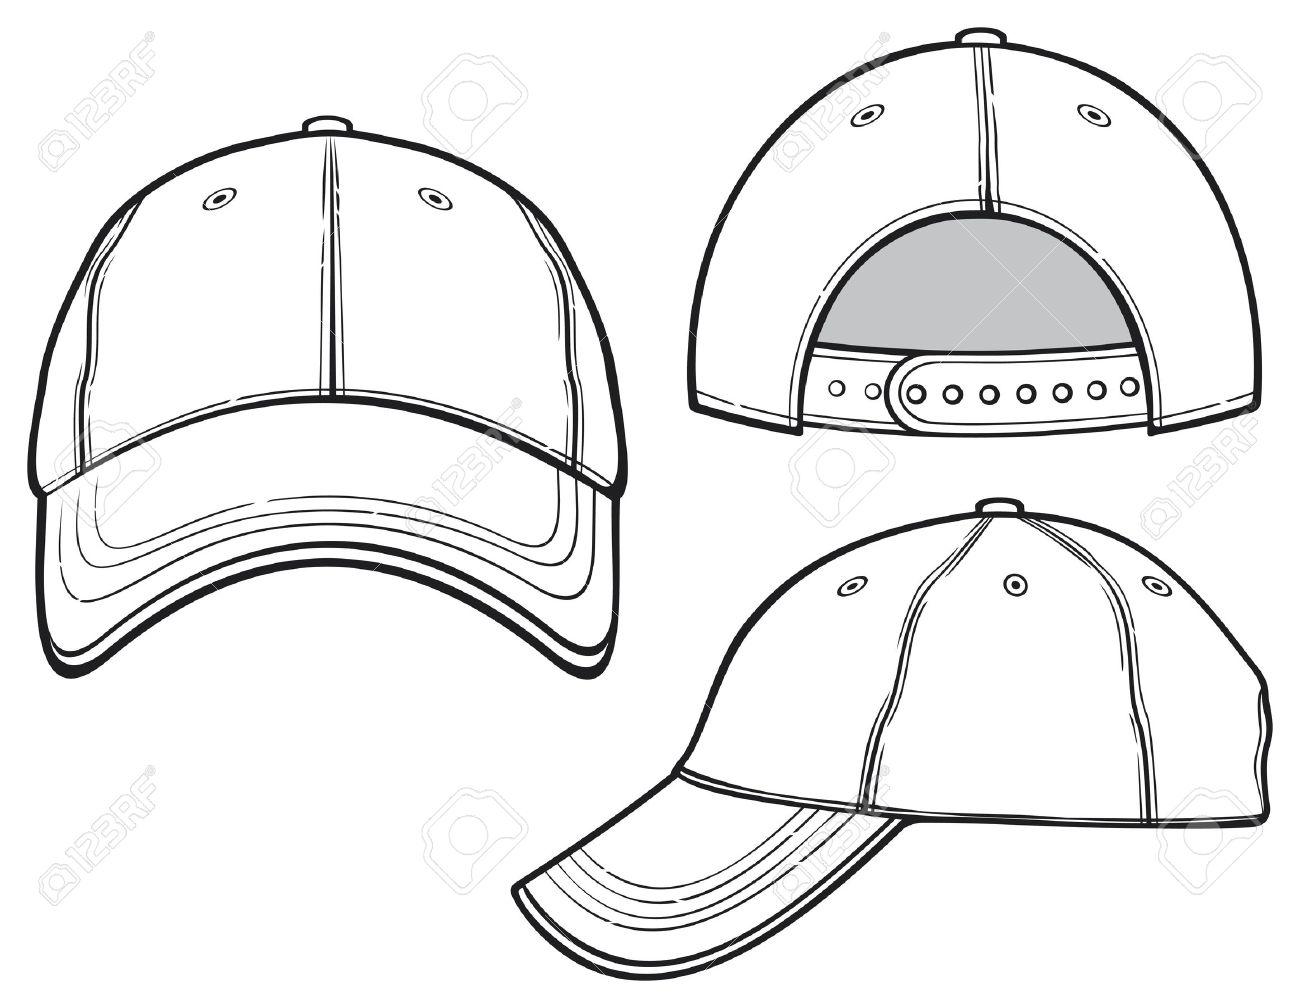 baseball cap royalty free cliparts vectors and stock illustration